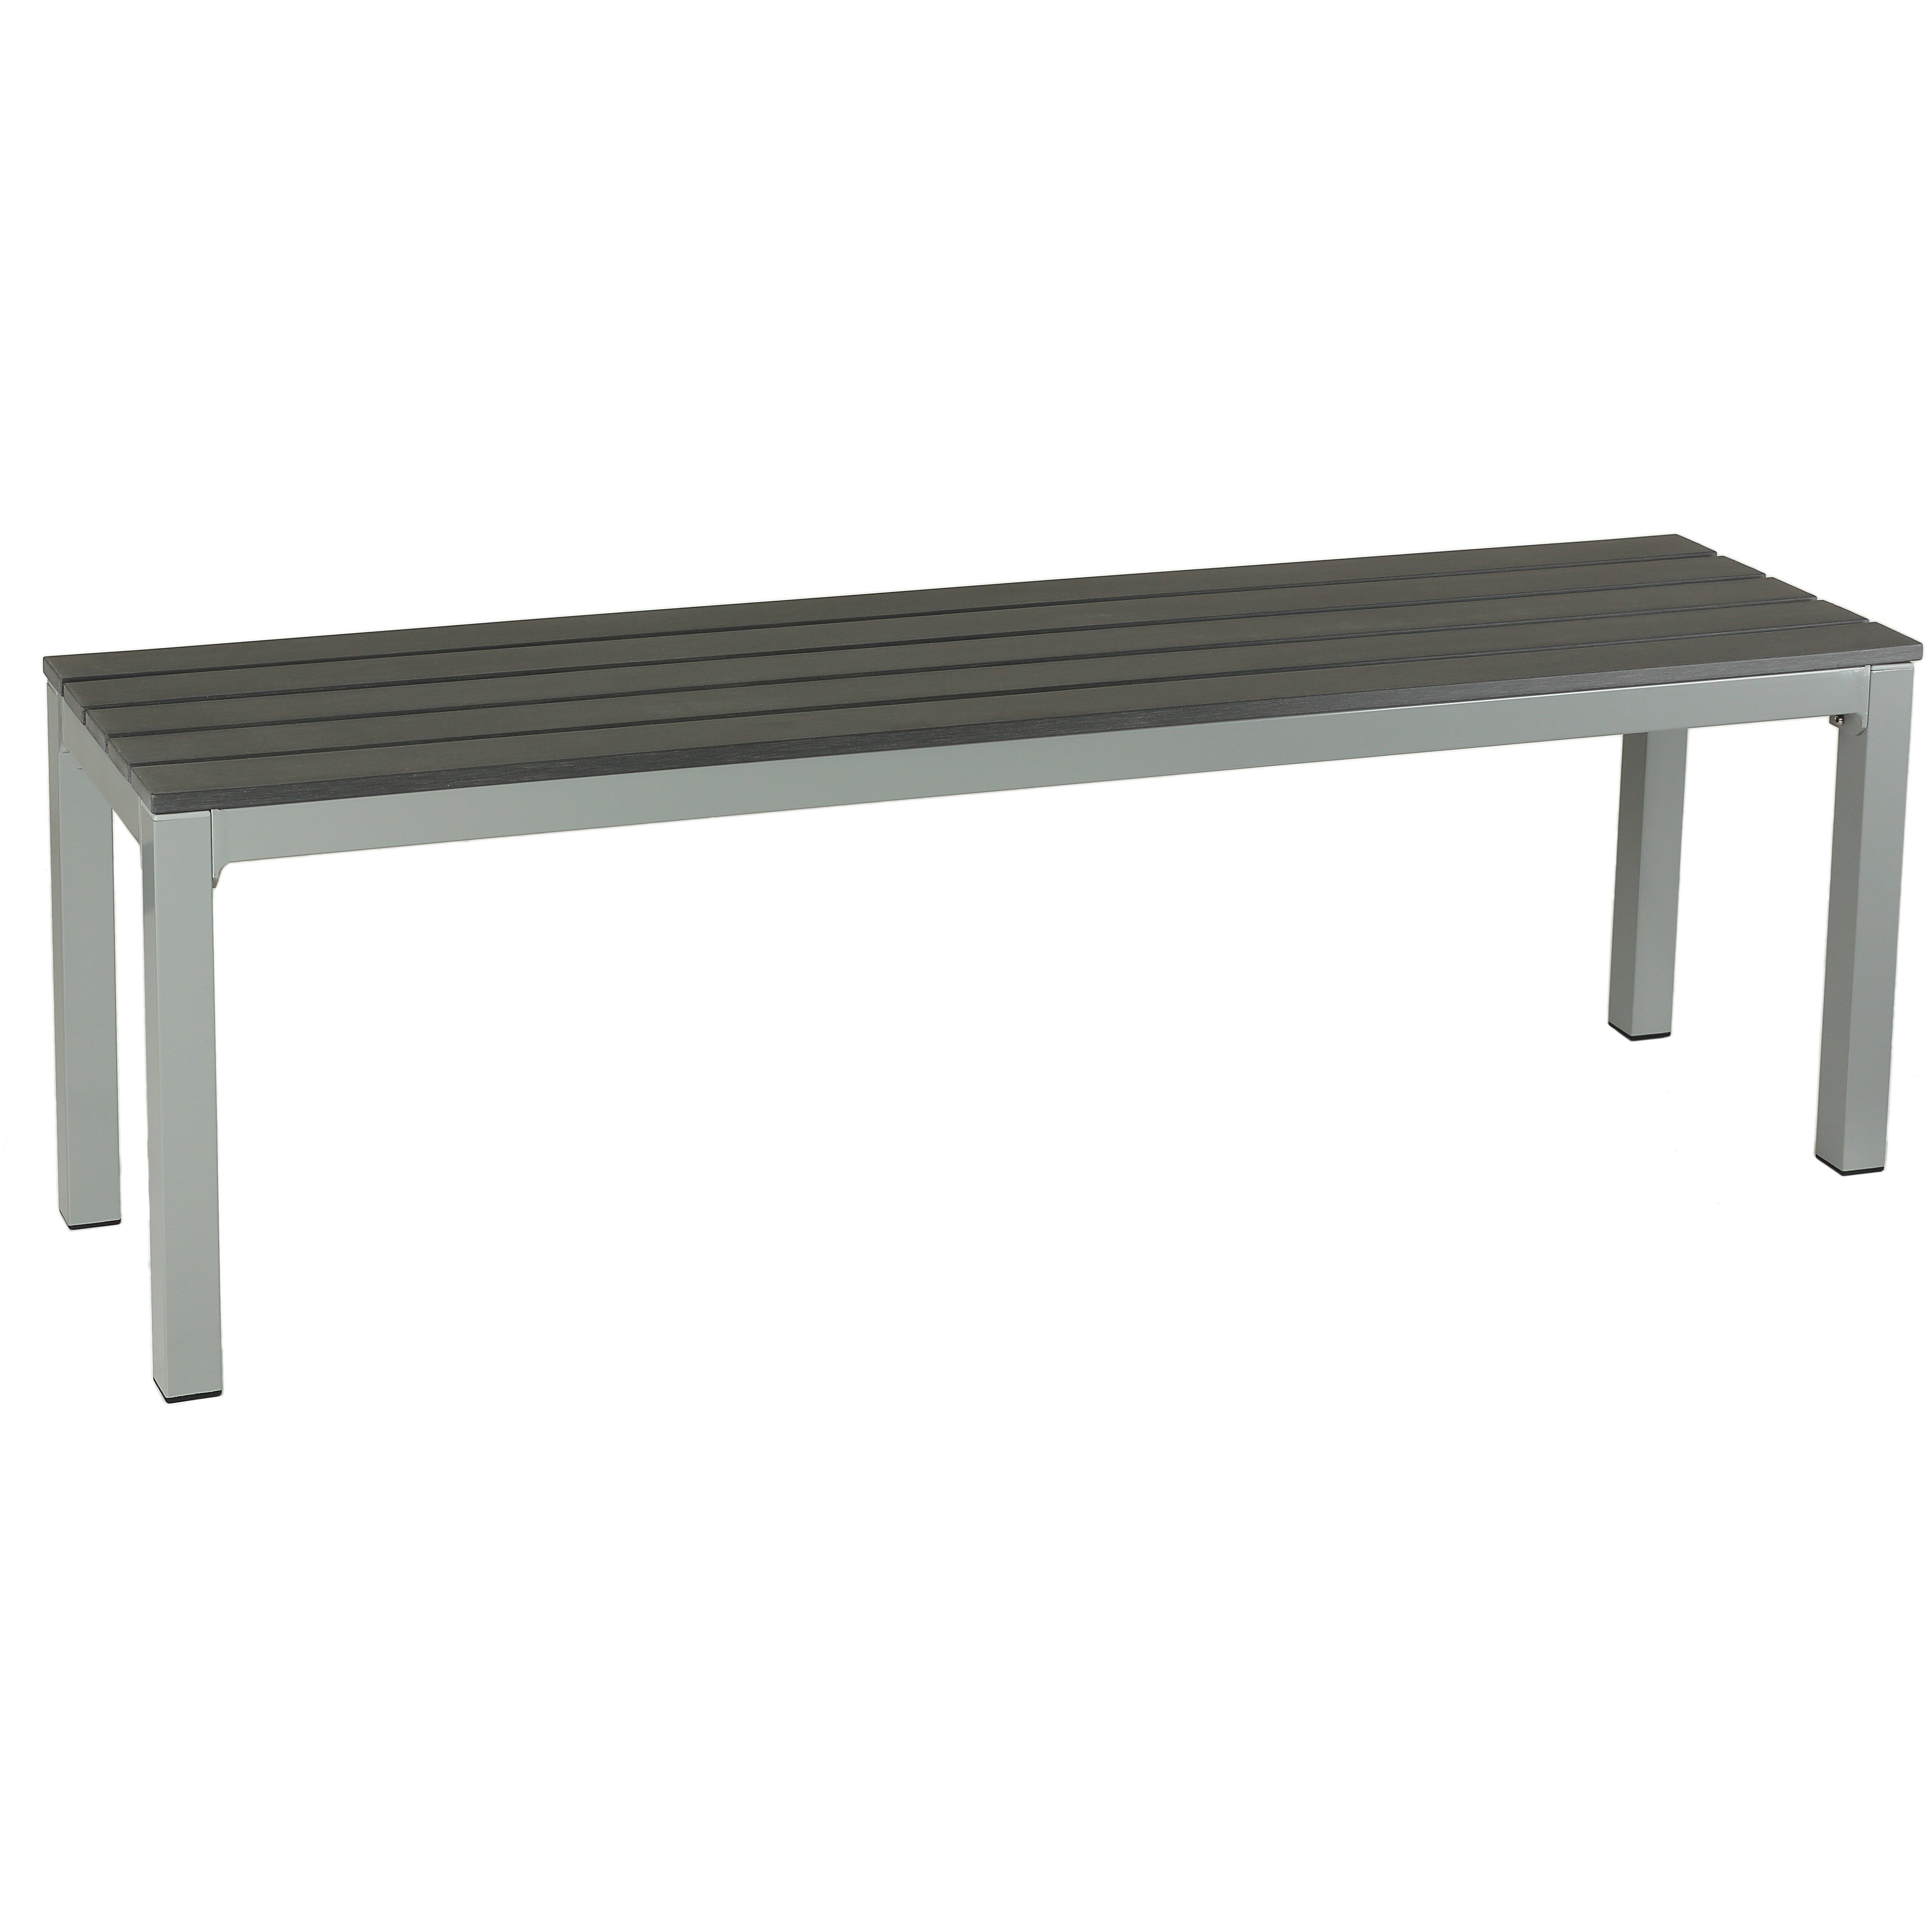 Cortesi Home Jaxon Aluminum Picnic Bench Reviews Wayfair